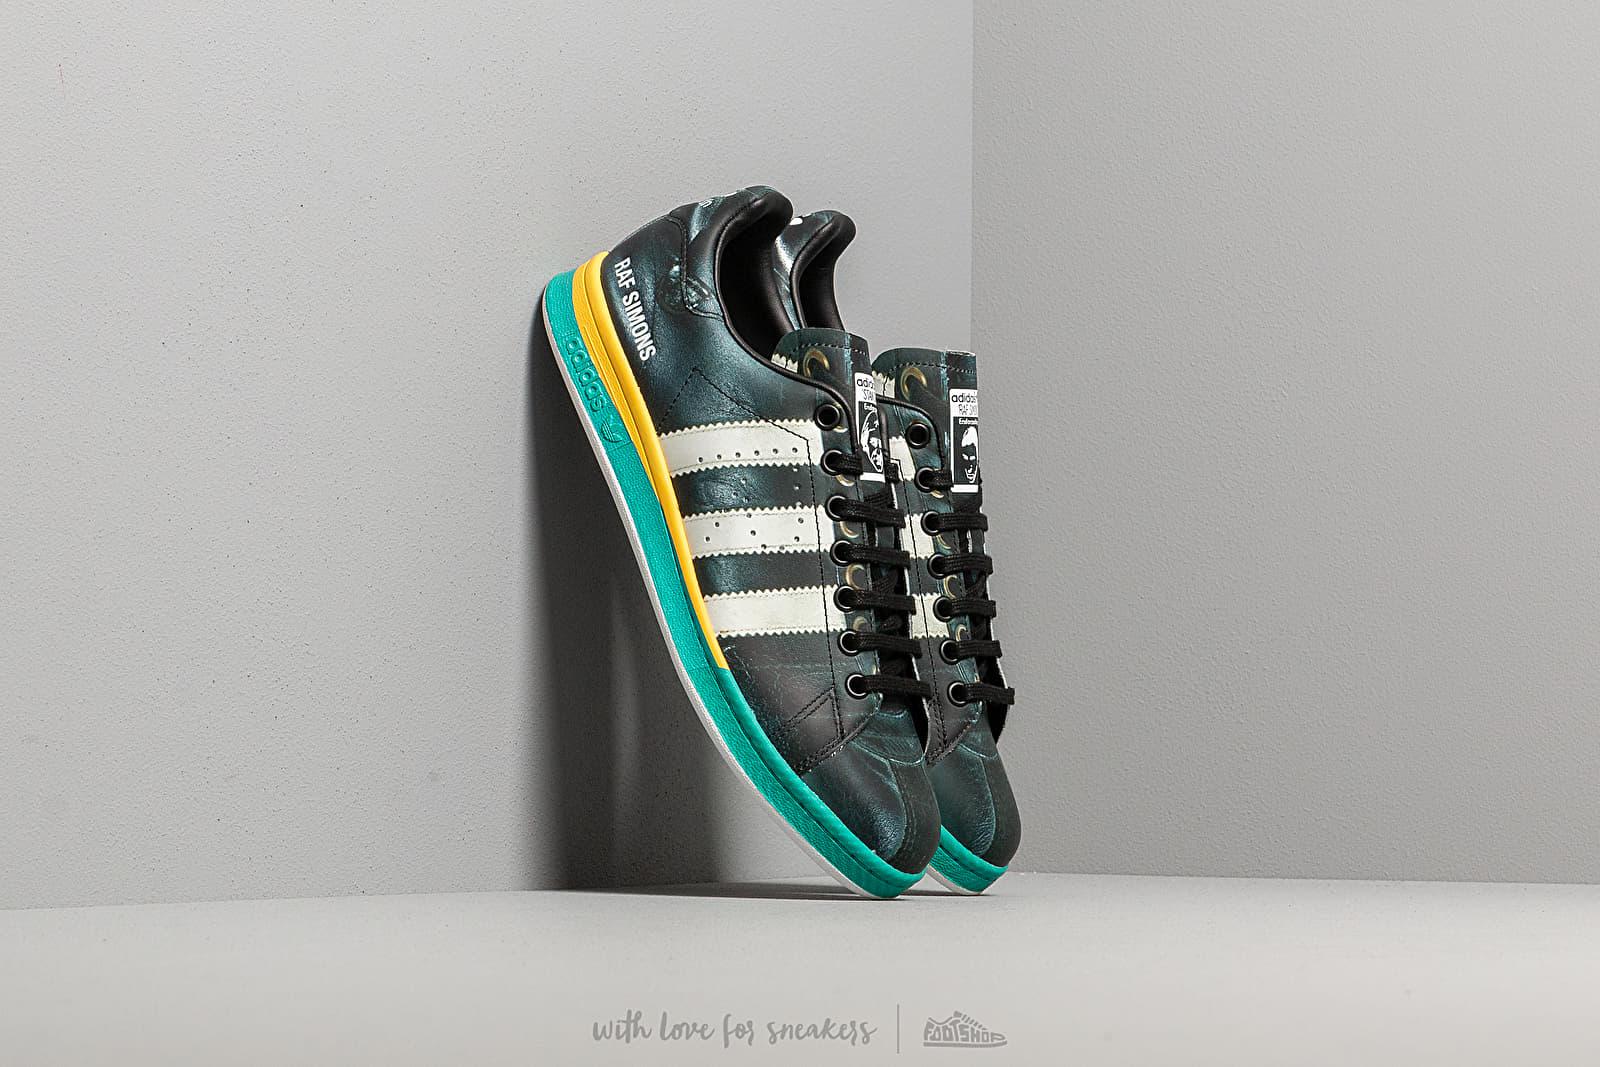 Beste Adidas Von Raf Simons Raf Simons Samba Stan | Schuhe